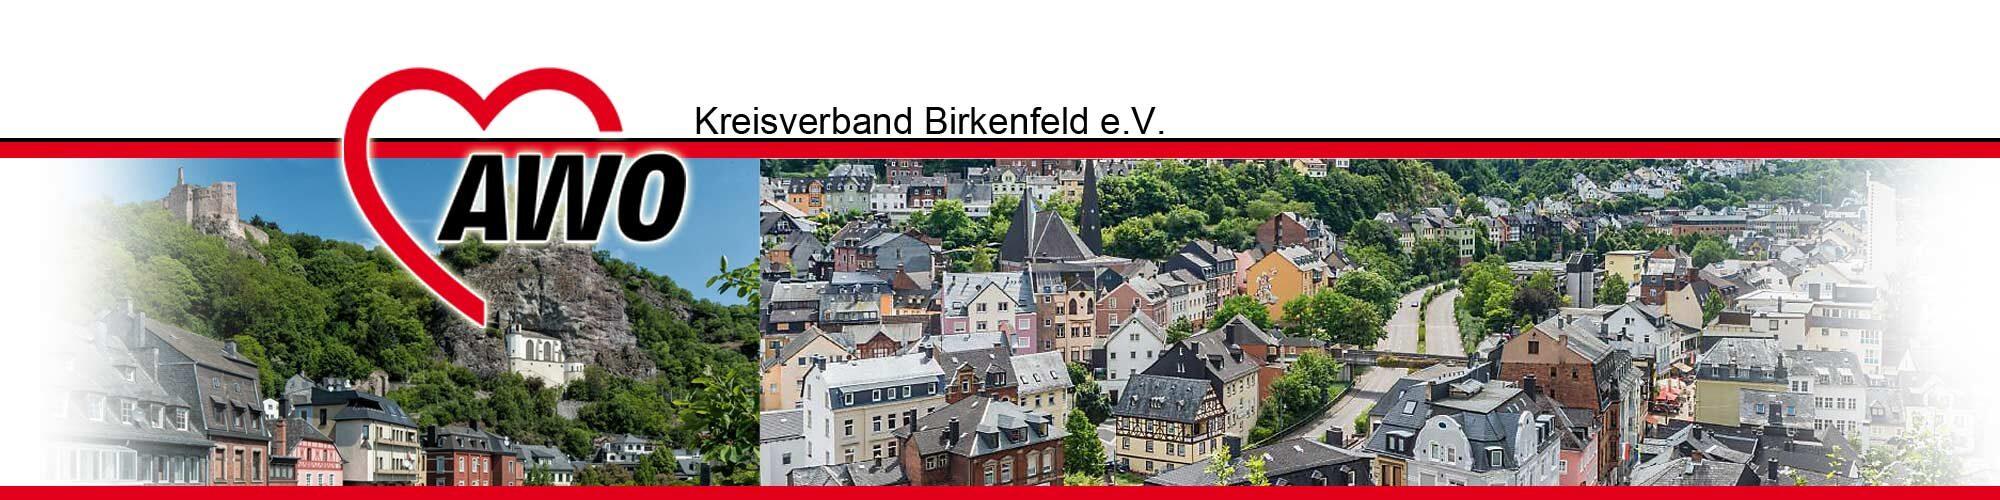 AWO Kreisverband Birkenfeld